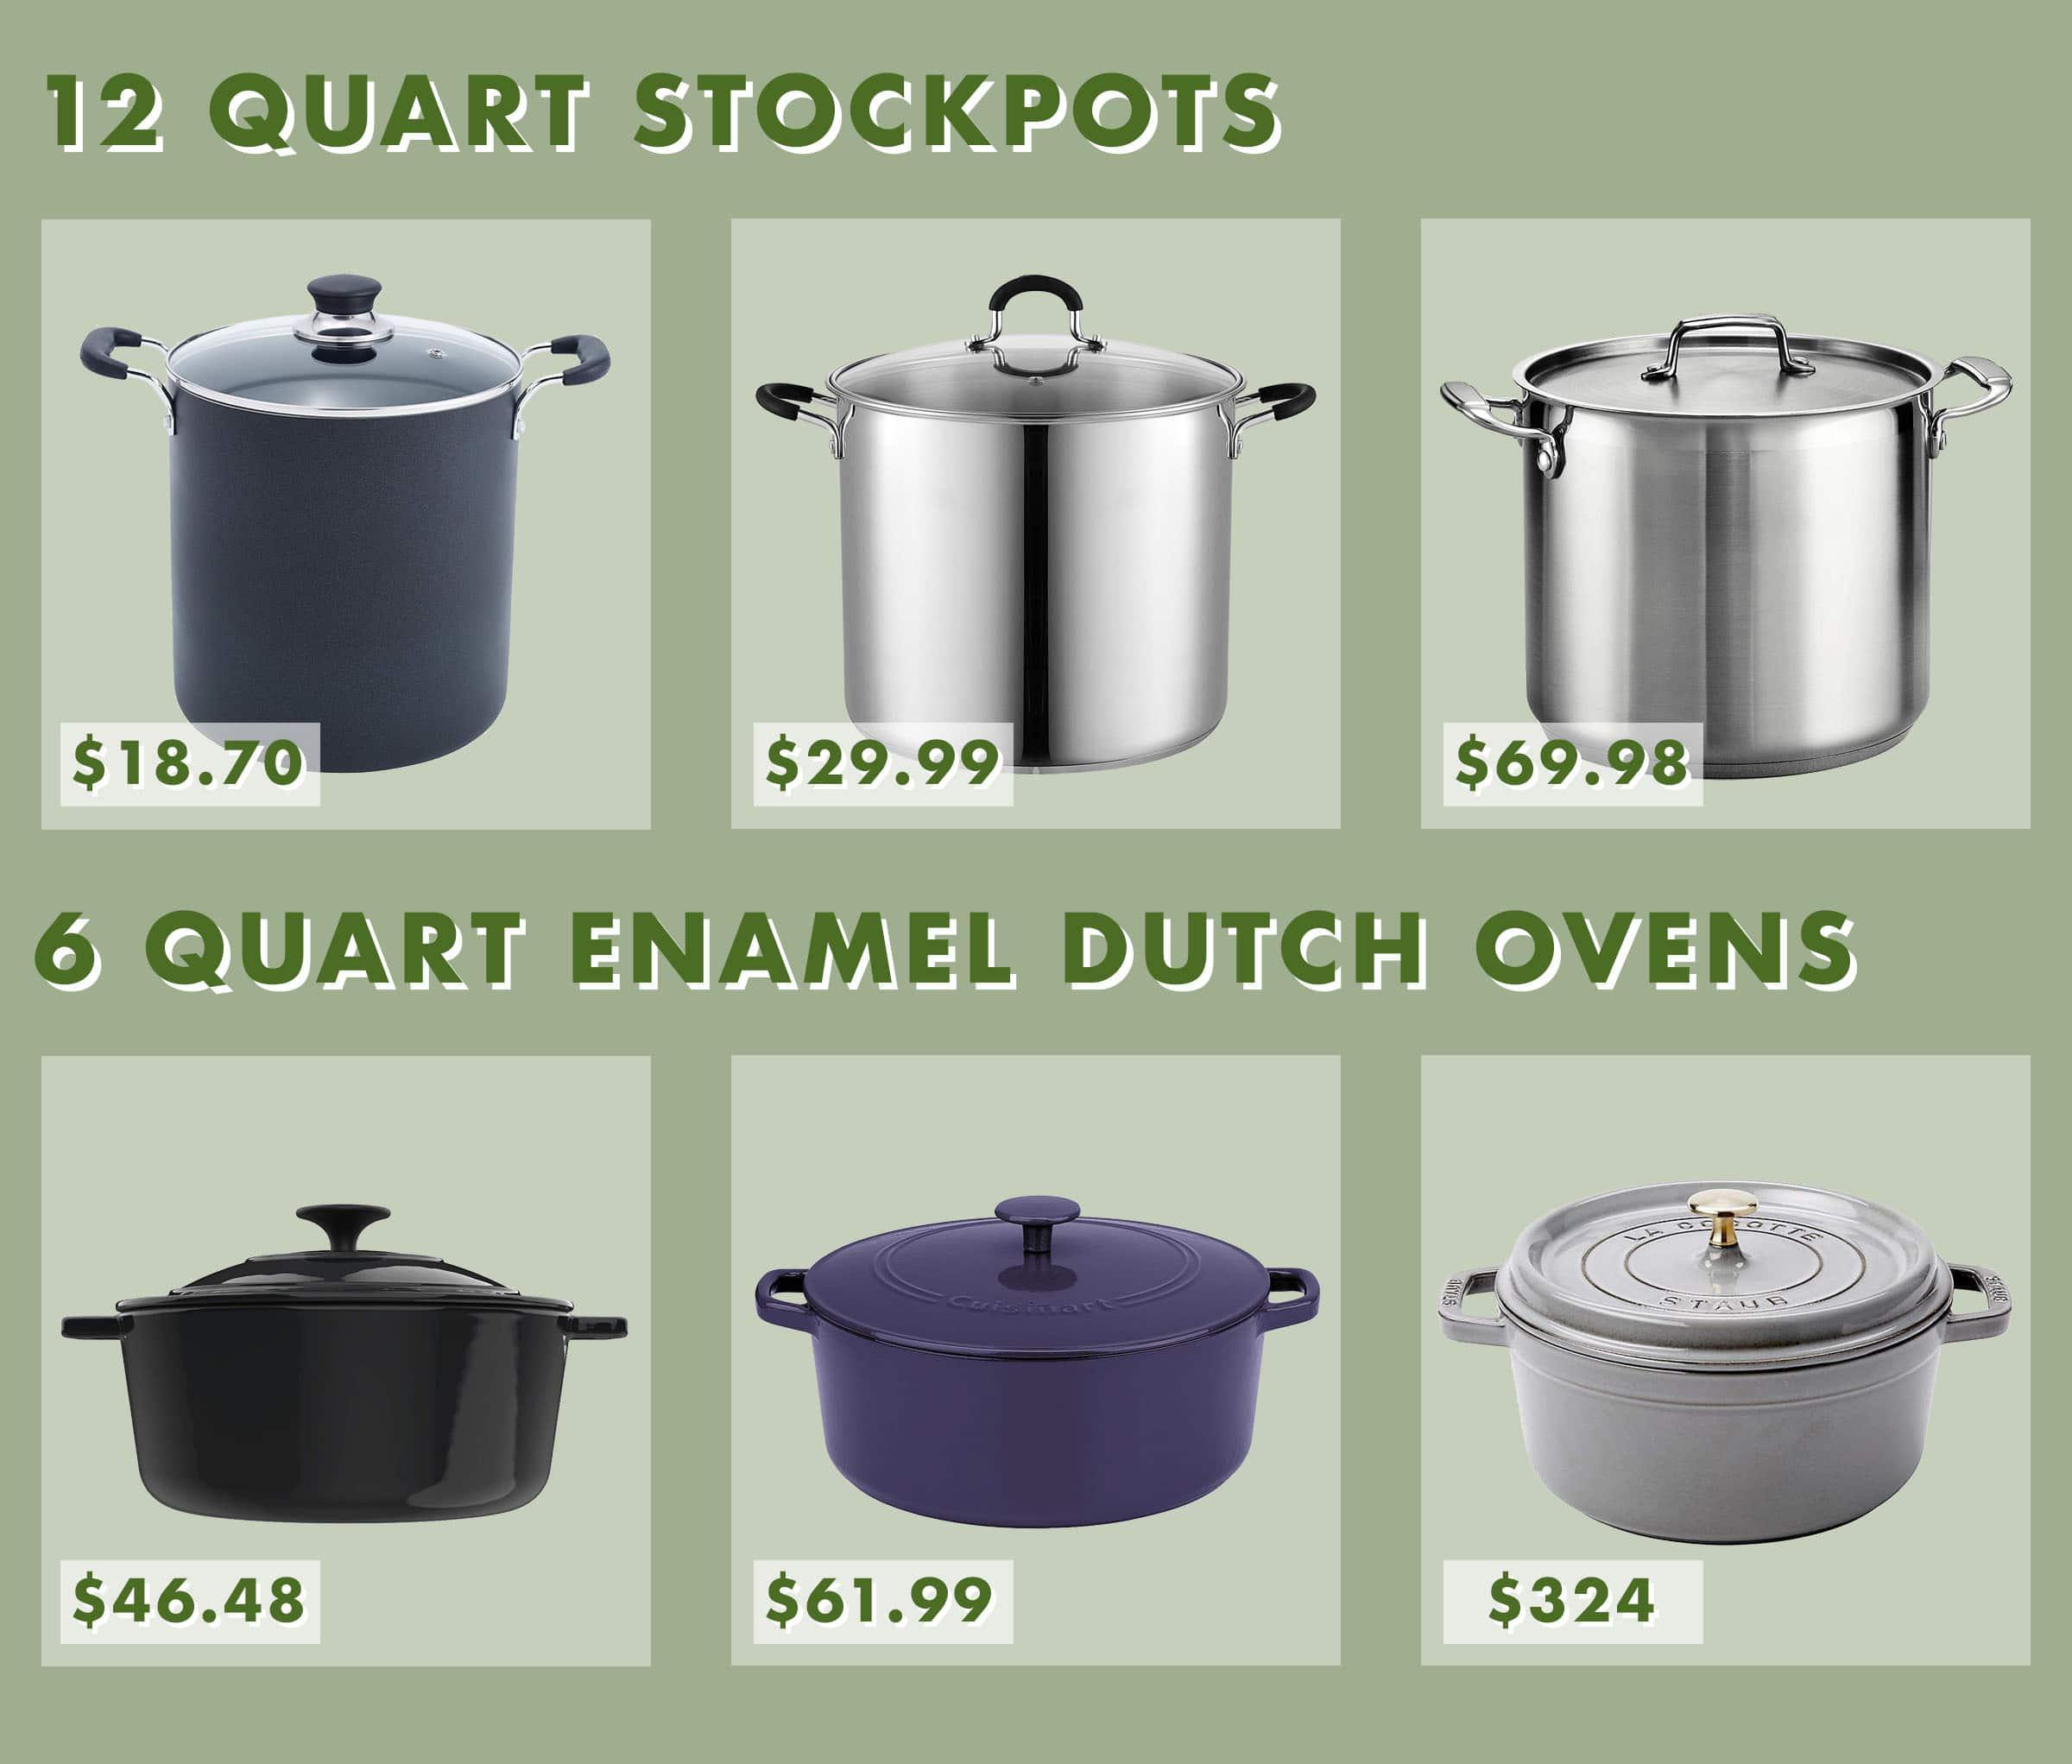 12 Quart Stockpot And 6 Quart Dutch Oven Grpahics